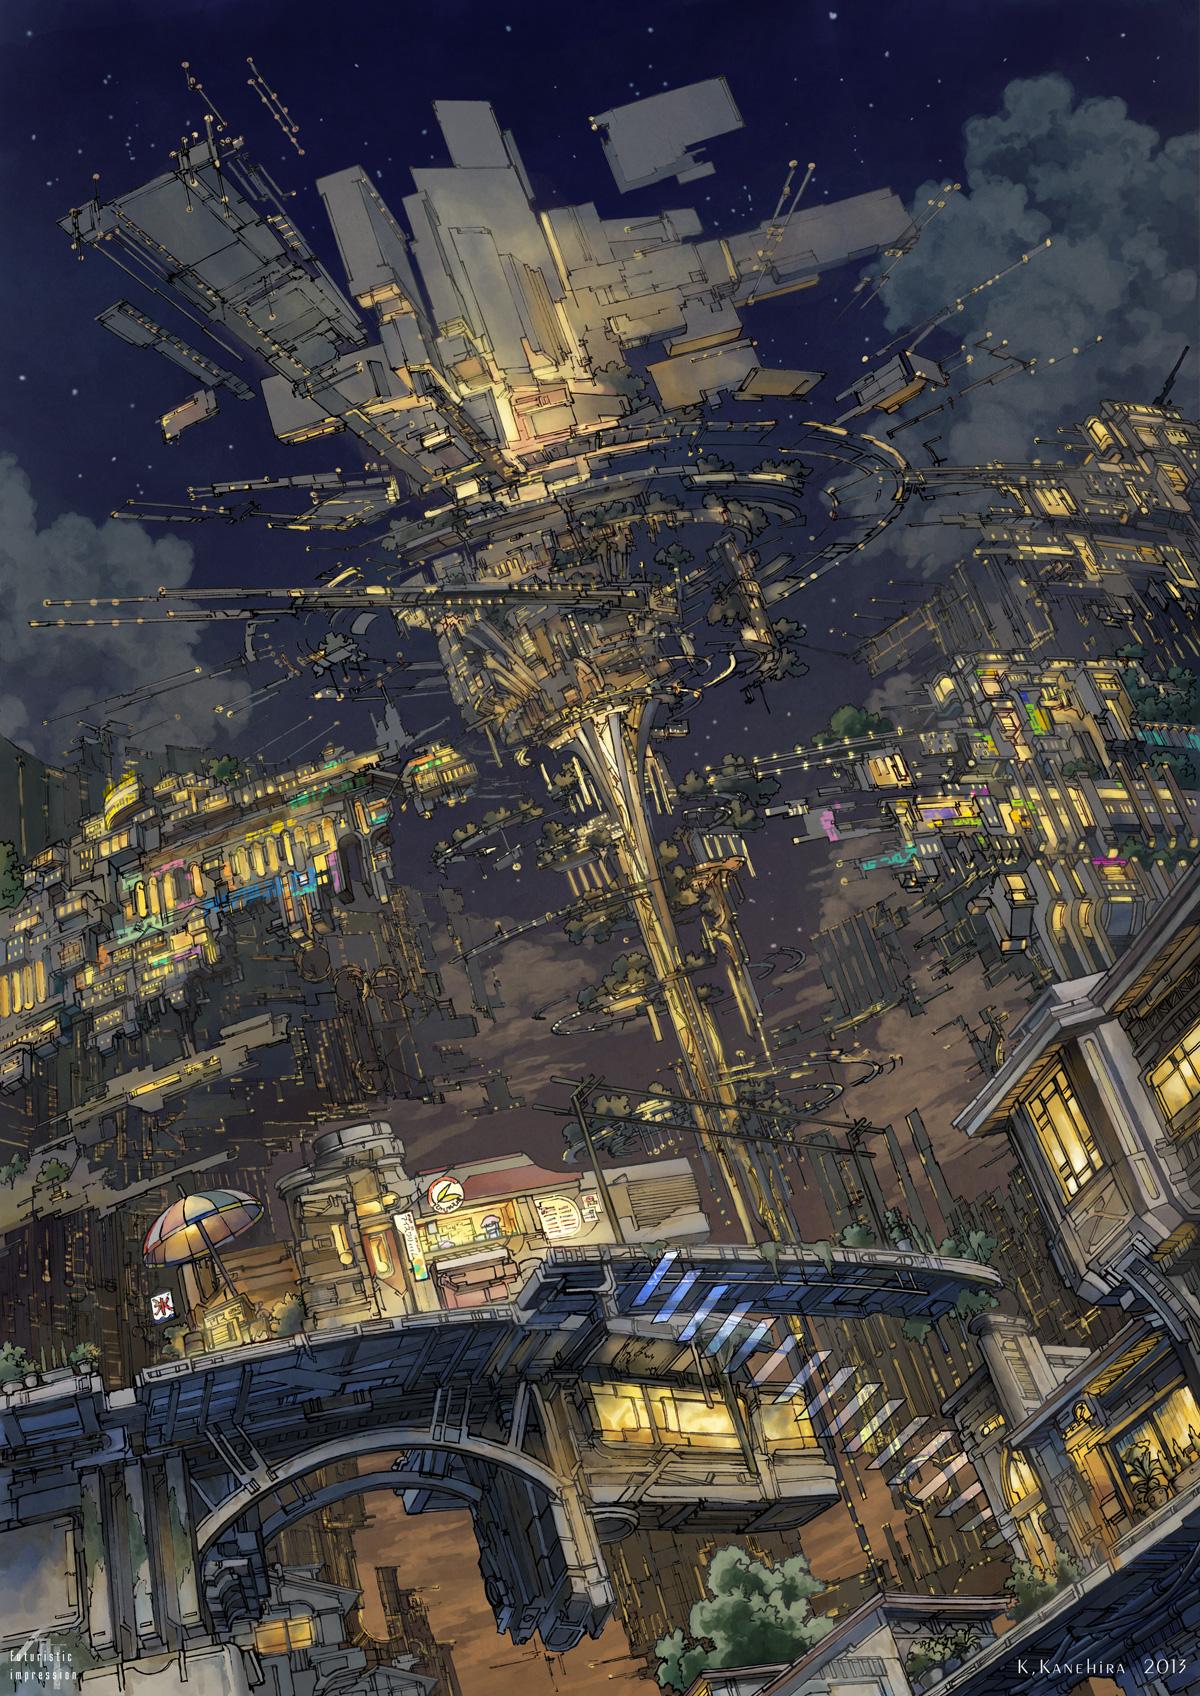 Top-Ten-Pixiv-Artworks-of-the-Week-#1_#8_浮遊遺跡ライトアップ_K,Kanehira_Haruhichan.com